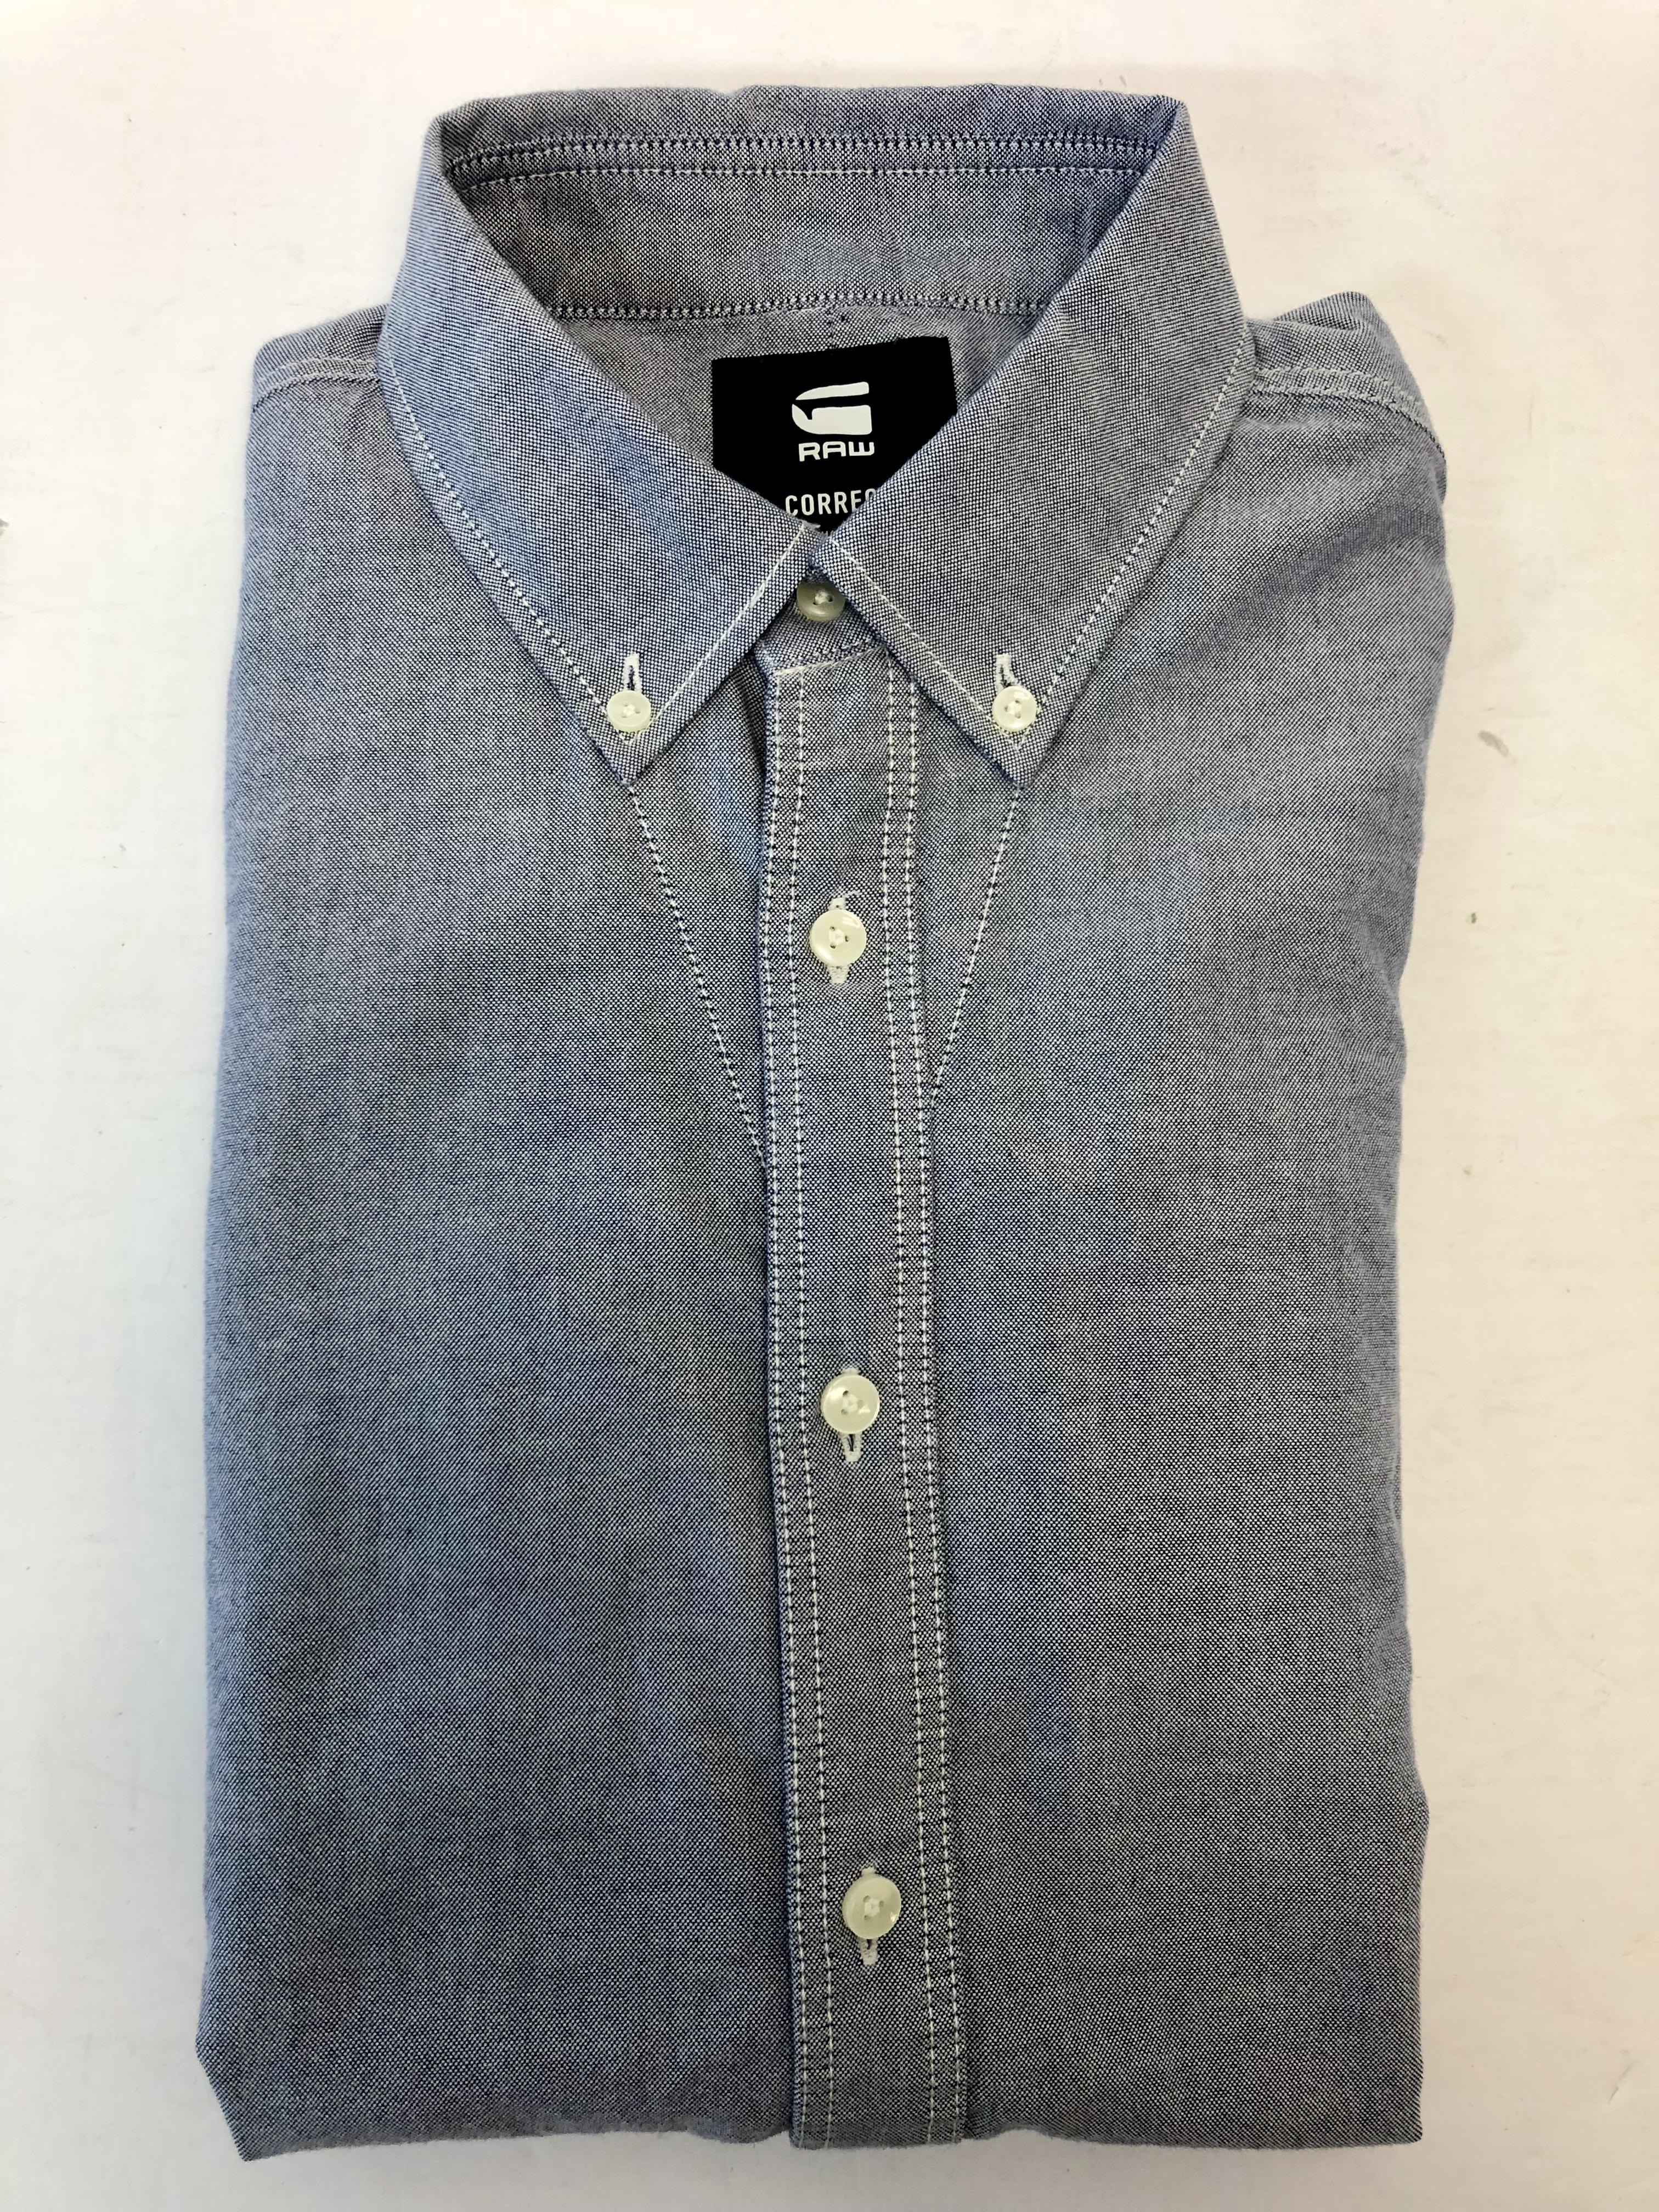 2cdaf82c2a New G-Star Raw Oxford Button Down Men s Long Sleeve Shirt